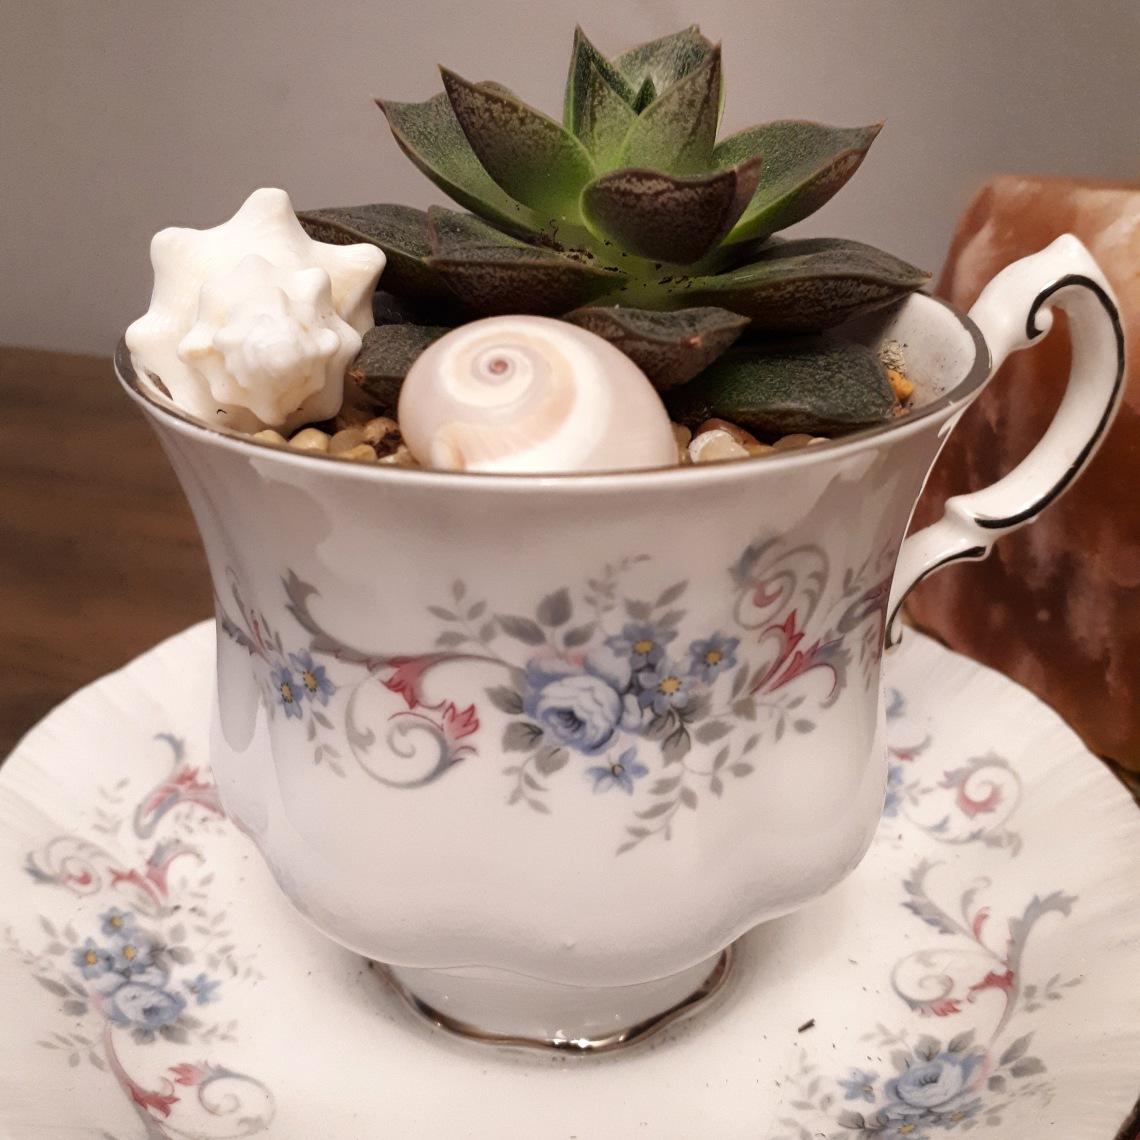 322 cup of pretty.jpg